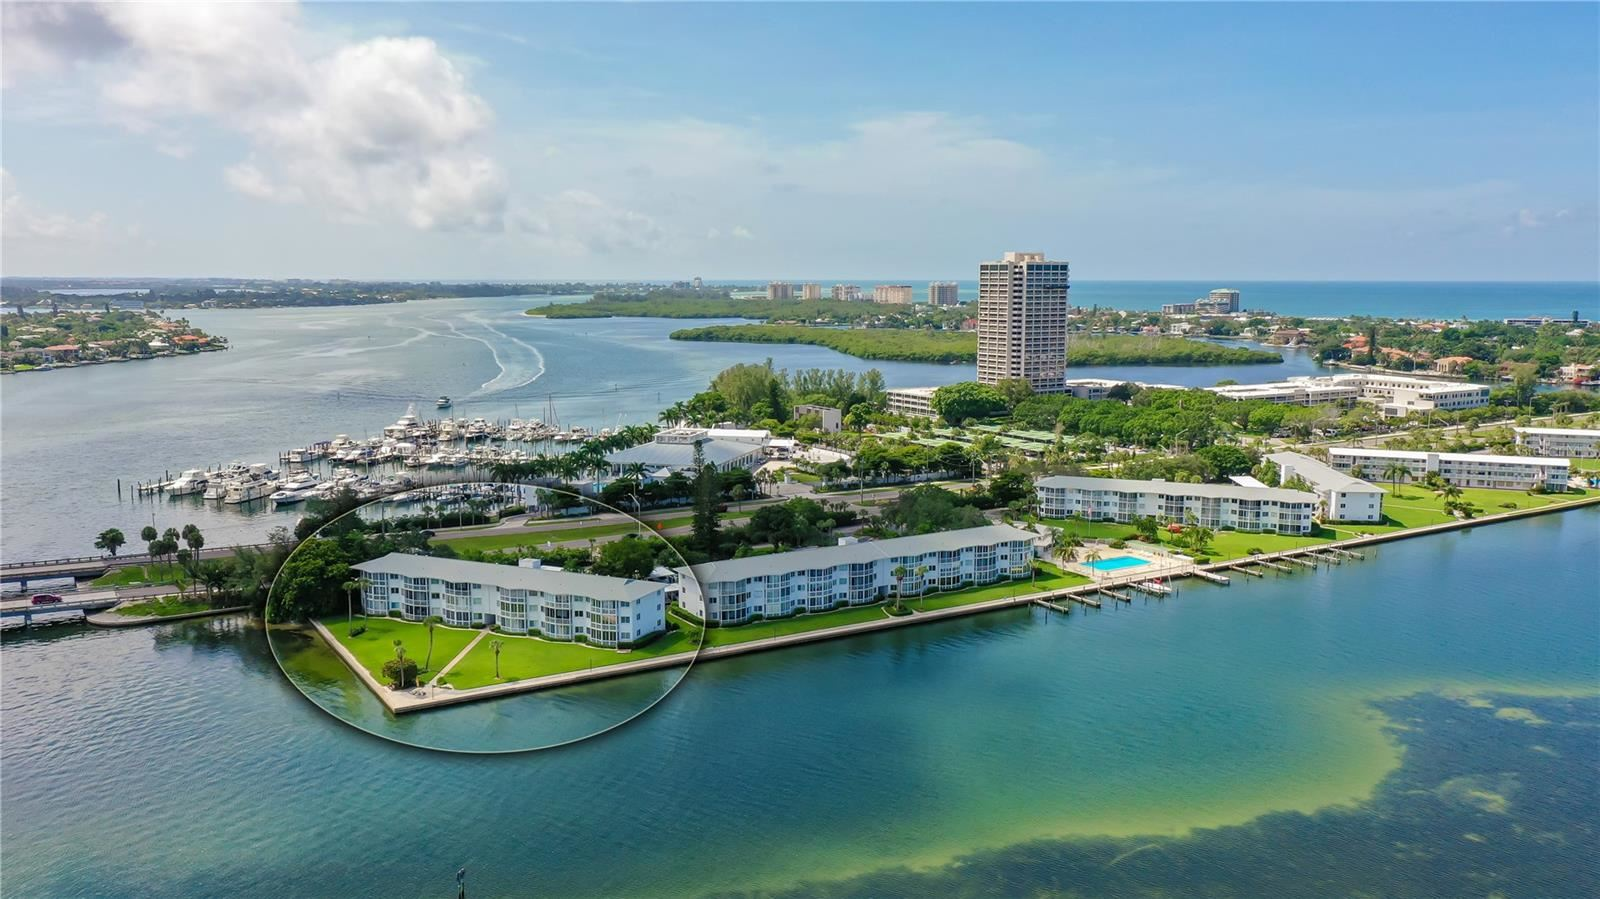 777 JOHN RINGLING BOULEVARD #25HAWT                                                                               Sarasota                                                                      , FL - $535,000